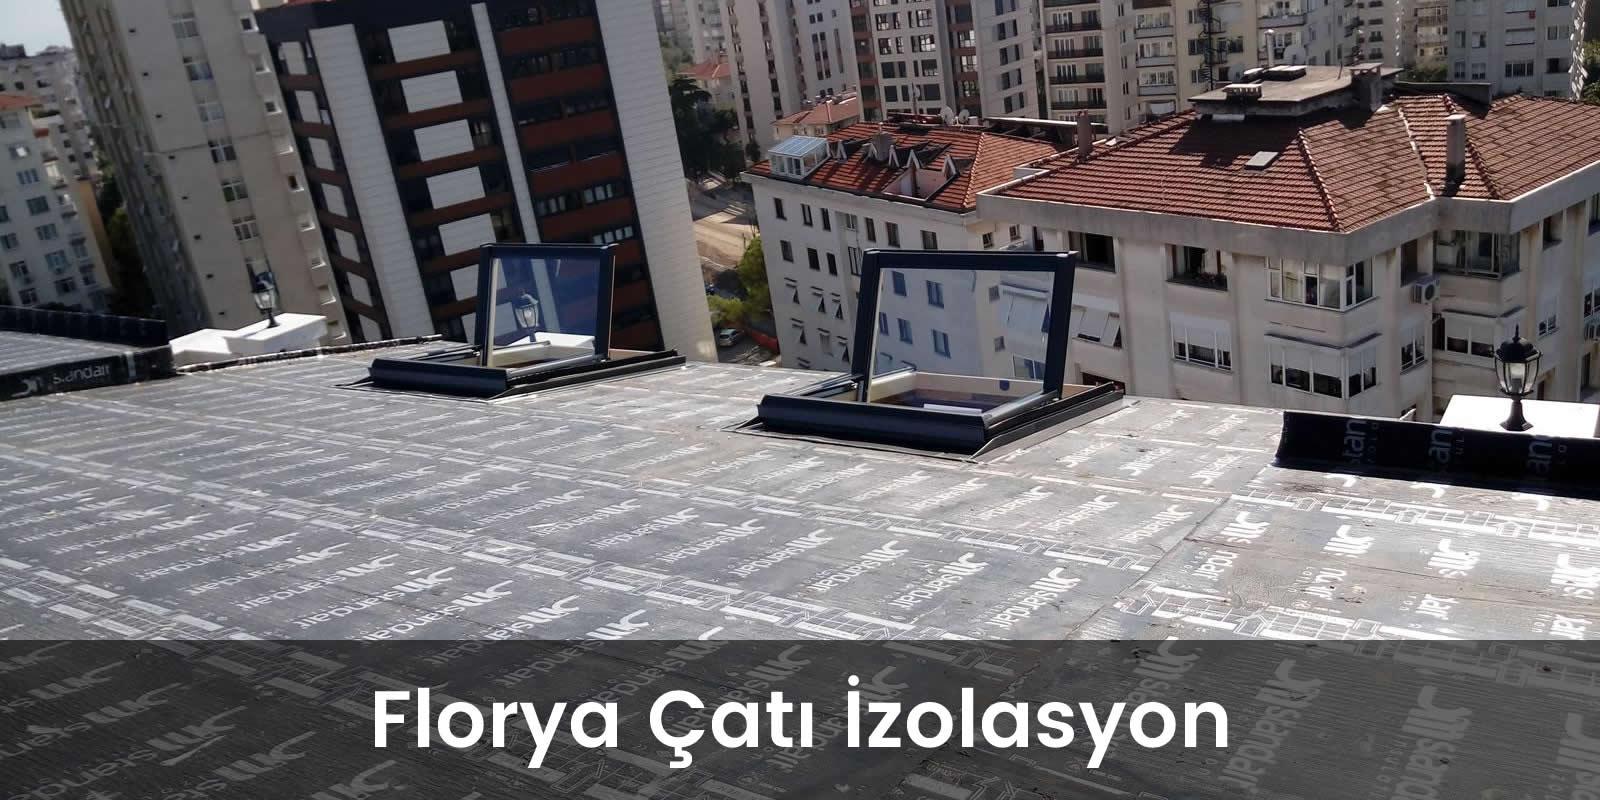 Florya çatı izolasyon